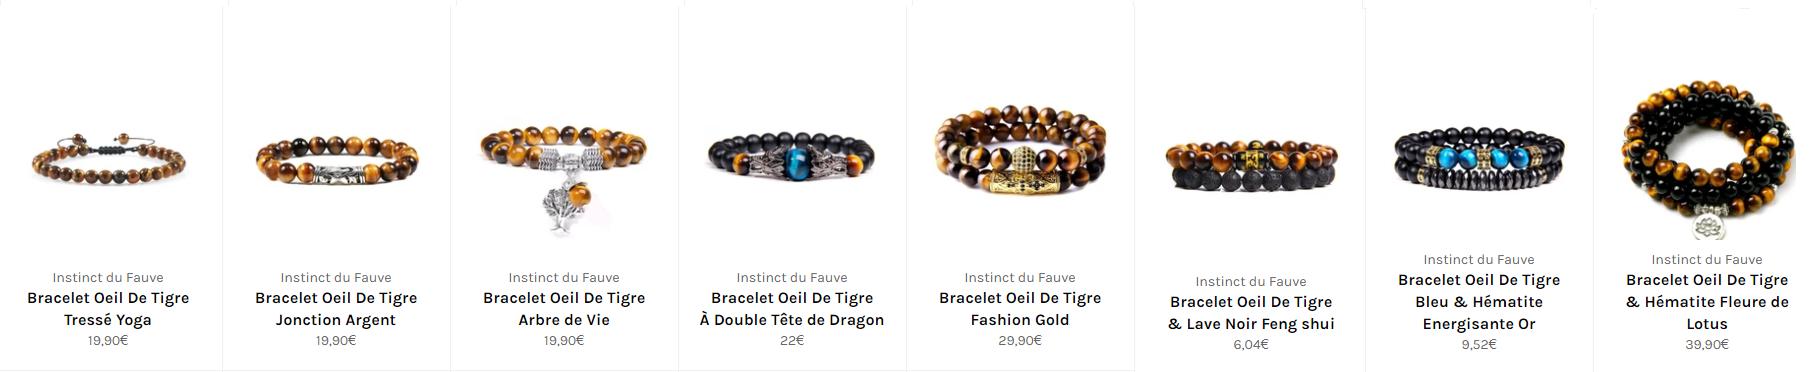 bracelet oeil de tigre de la Caspienne